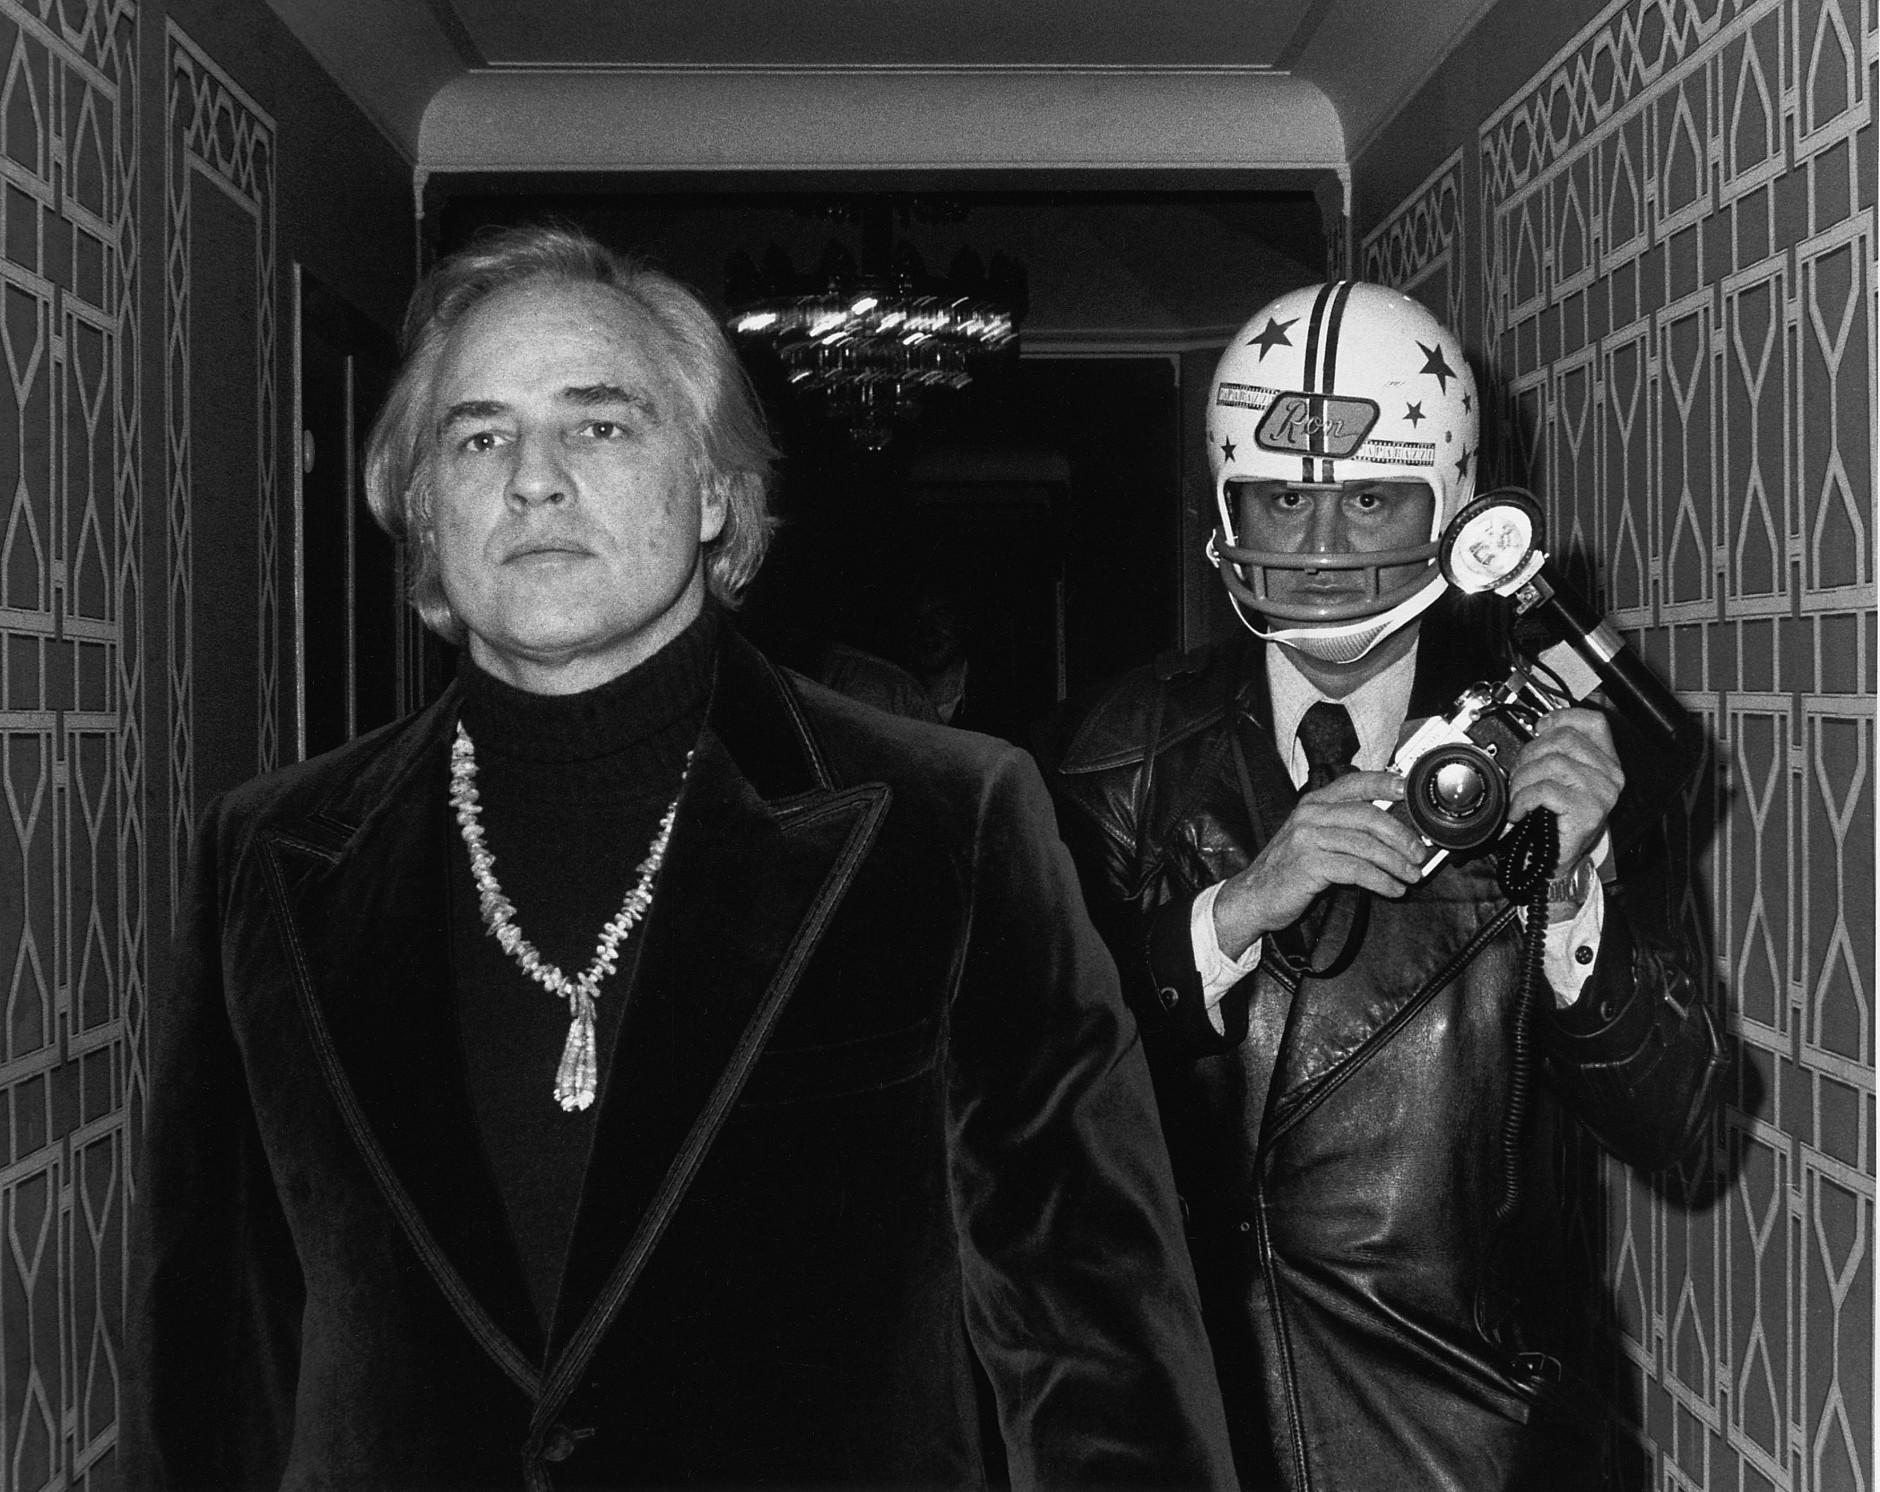 Paul Schmulbach: Guarding against the Godfather - Marlon Brando and Ron Galella, The Waldorf Hotel, New York, November 1974.  © Ron Galella, Ltd.